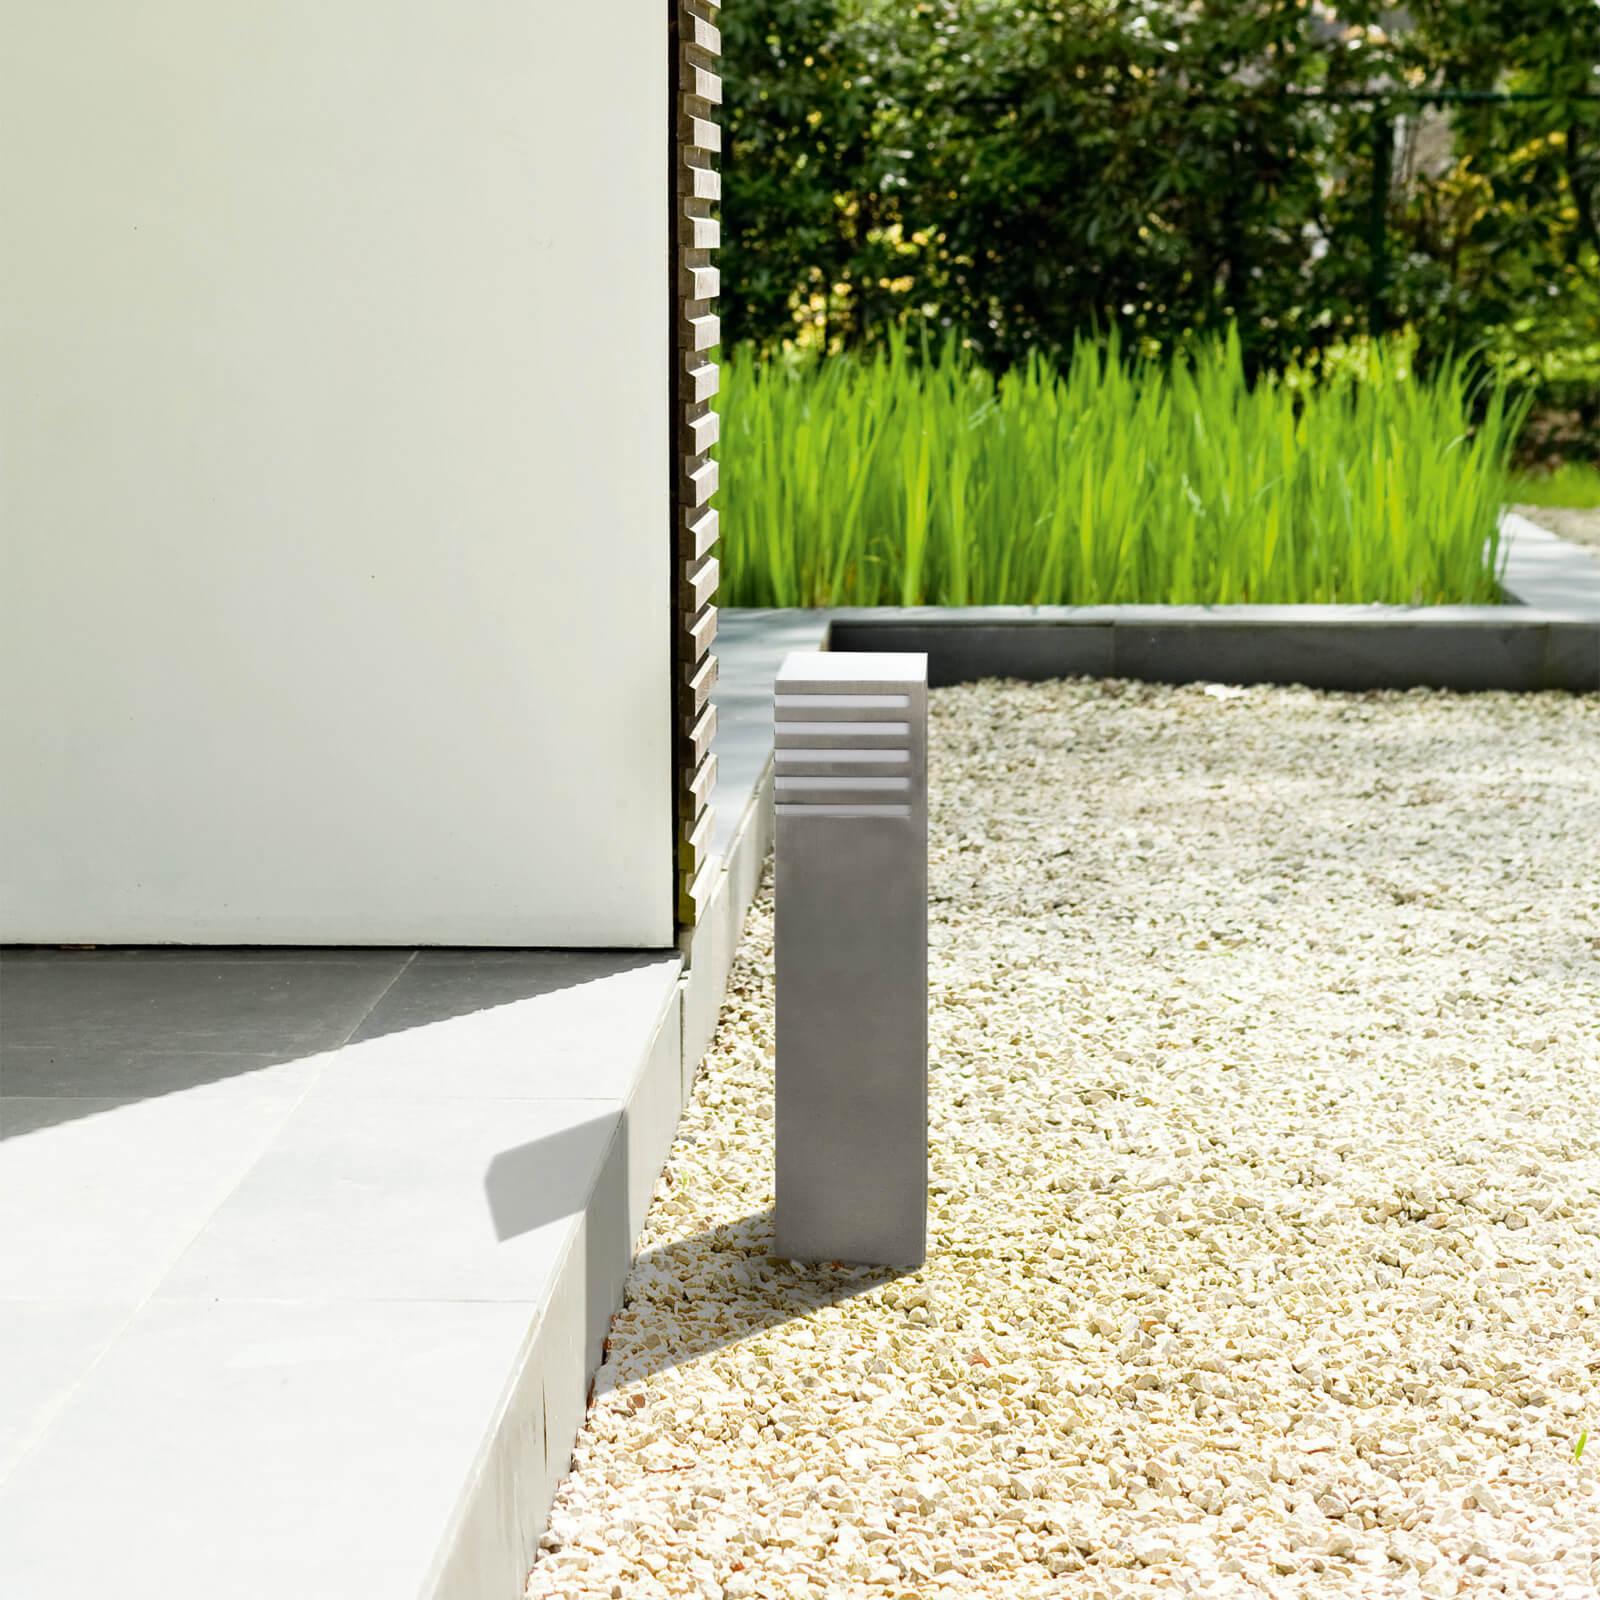 philips mygarden veranda sokkel rvs 40cm. Black Bedroom Furniture Sets. Home Design Ideas